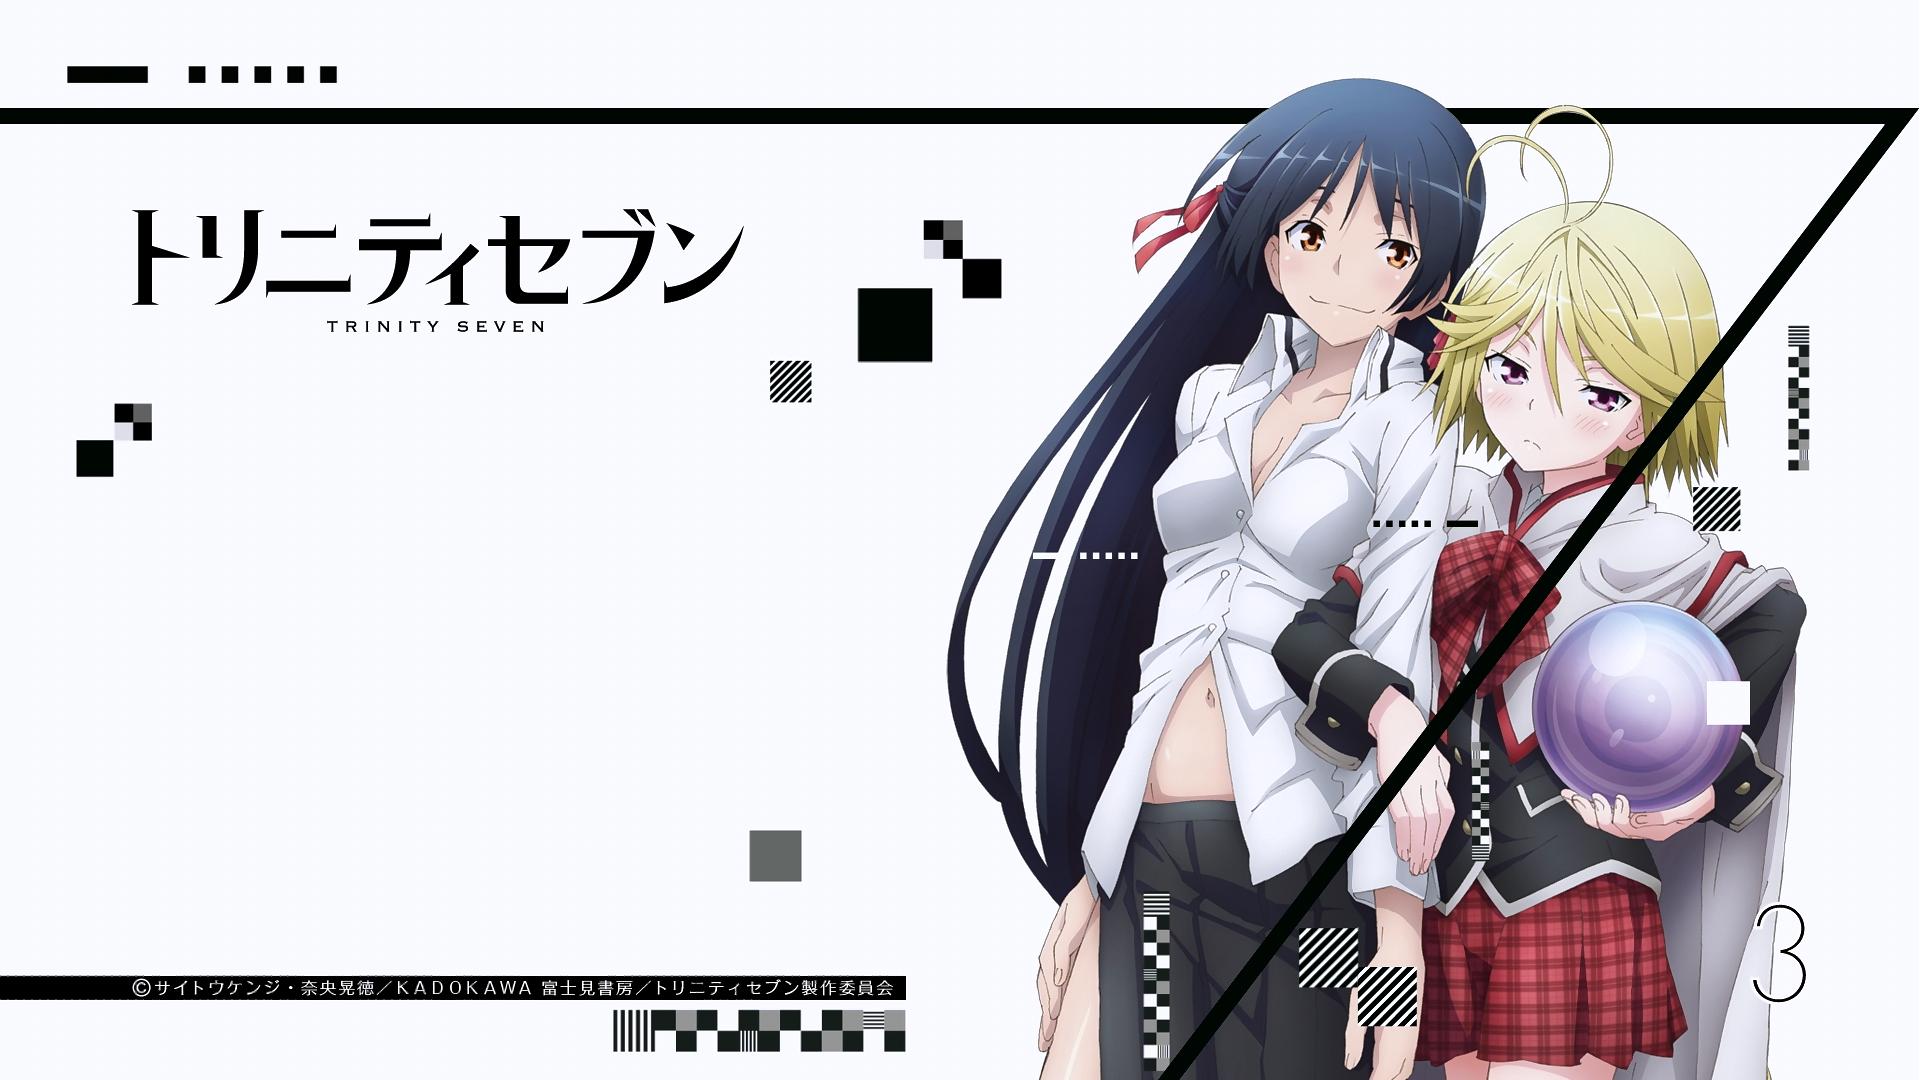 Fondos De Pantalla Anime Dibujos Animados Trinity Seven